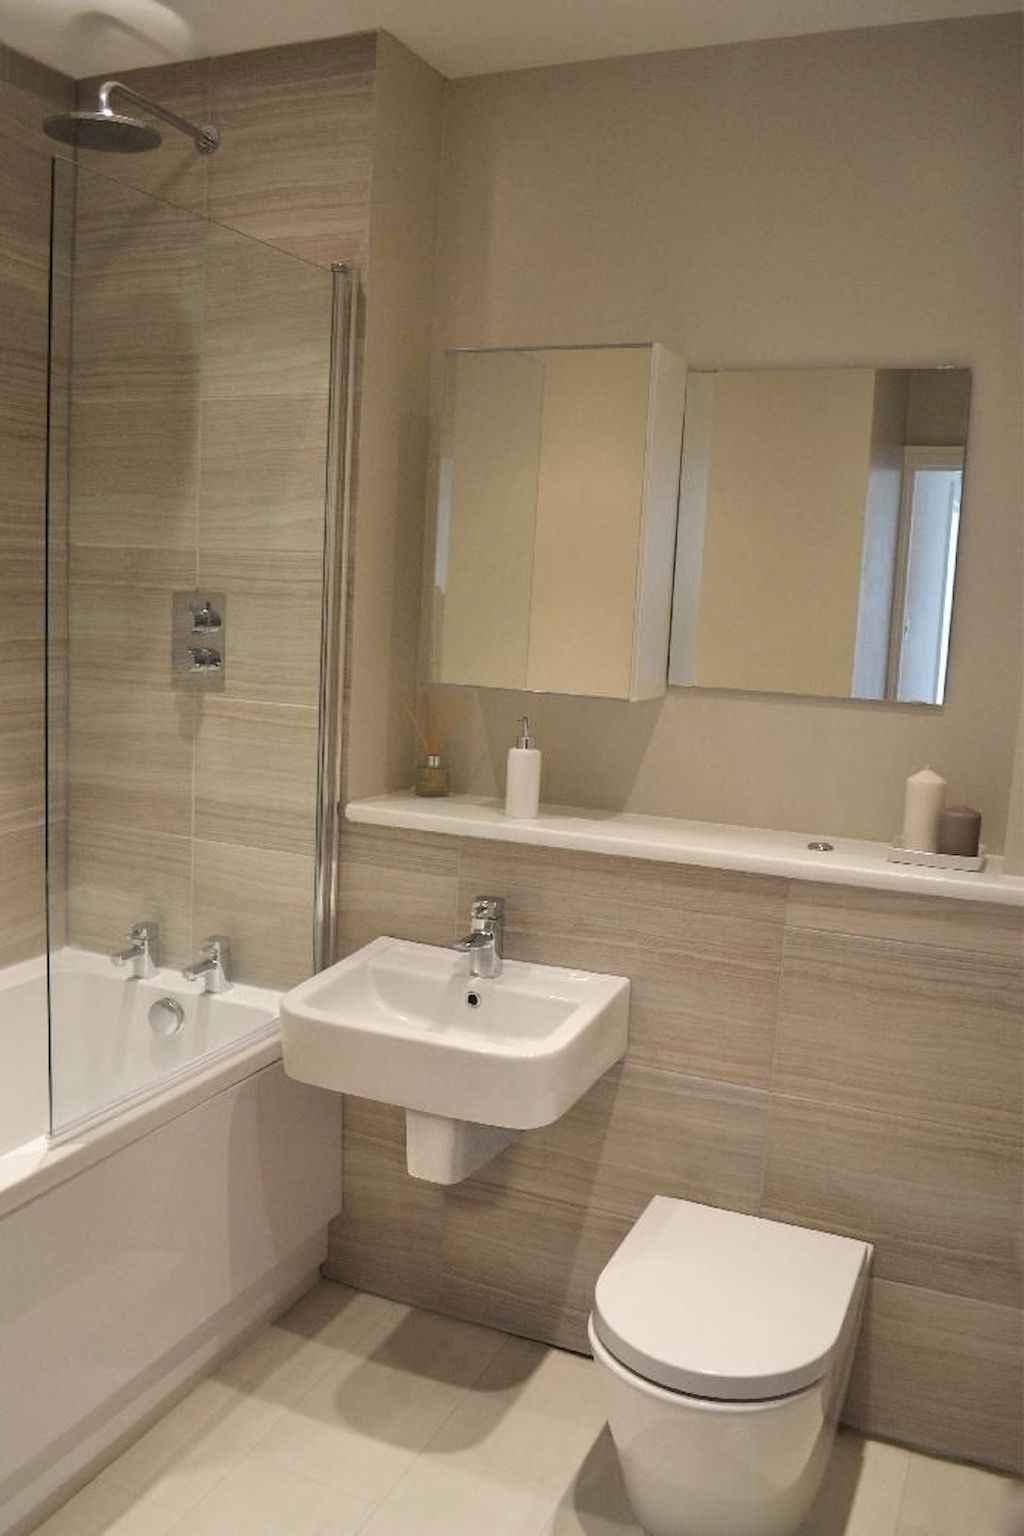 111 Brilliant Small Bathroom Remodel Ideas On A Budget (81)